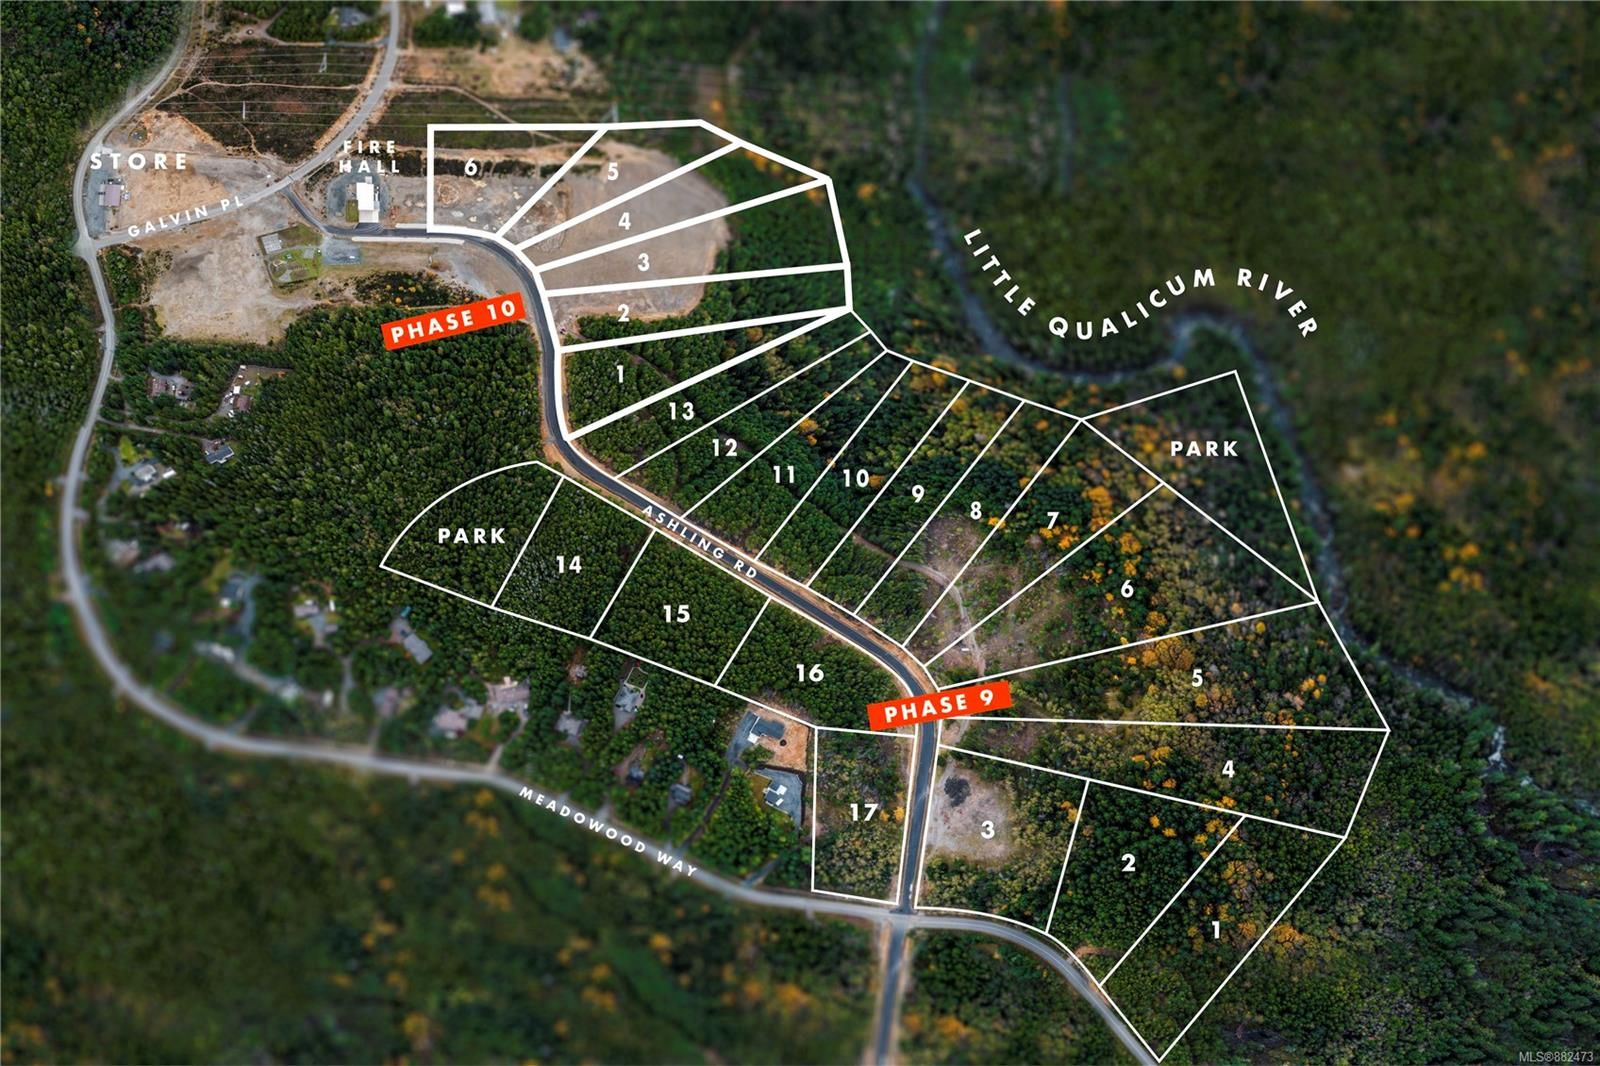 Main Photo: Lot 3 Ashling Rd in : PQ Qualicum North Land for sale (Parksville/Qualicum)  : MLS®# 882473